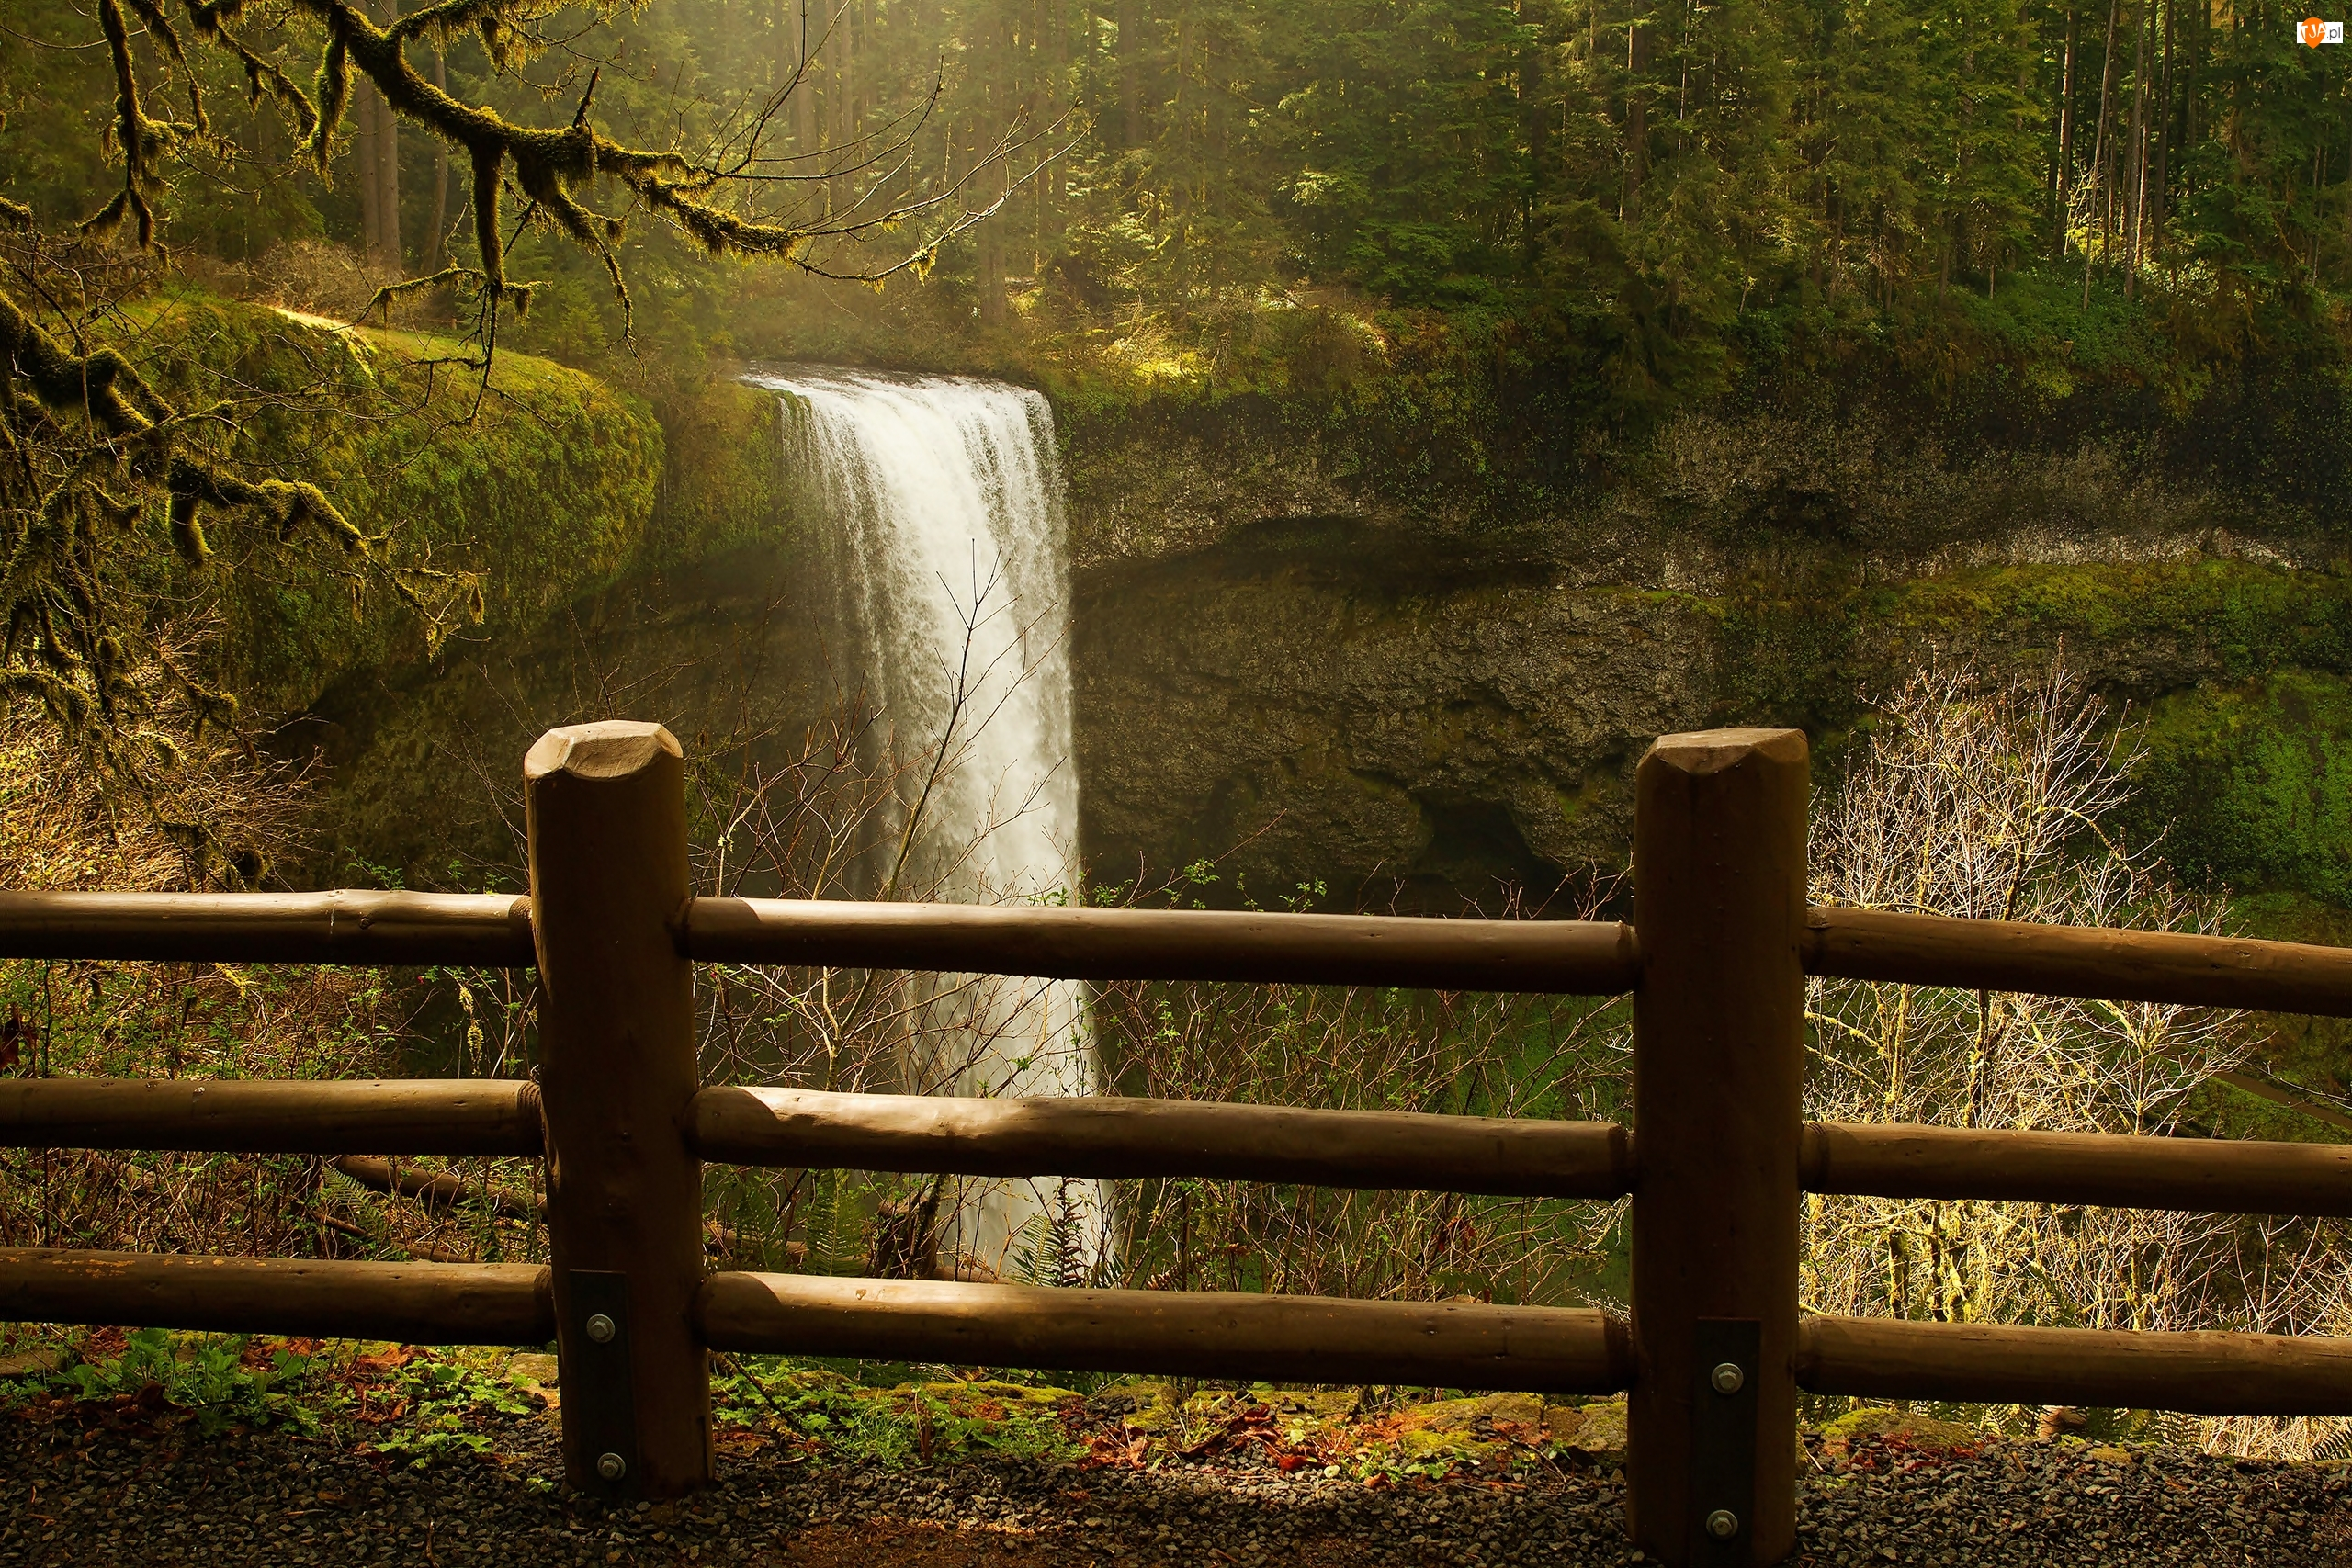 Stan Oregon, Stany Zjednoczone, Wodospad South Falls, Płot, Park Stanowy Silver Falls, Las